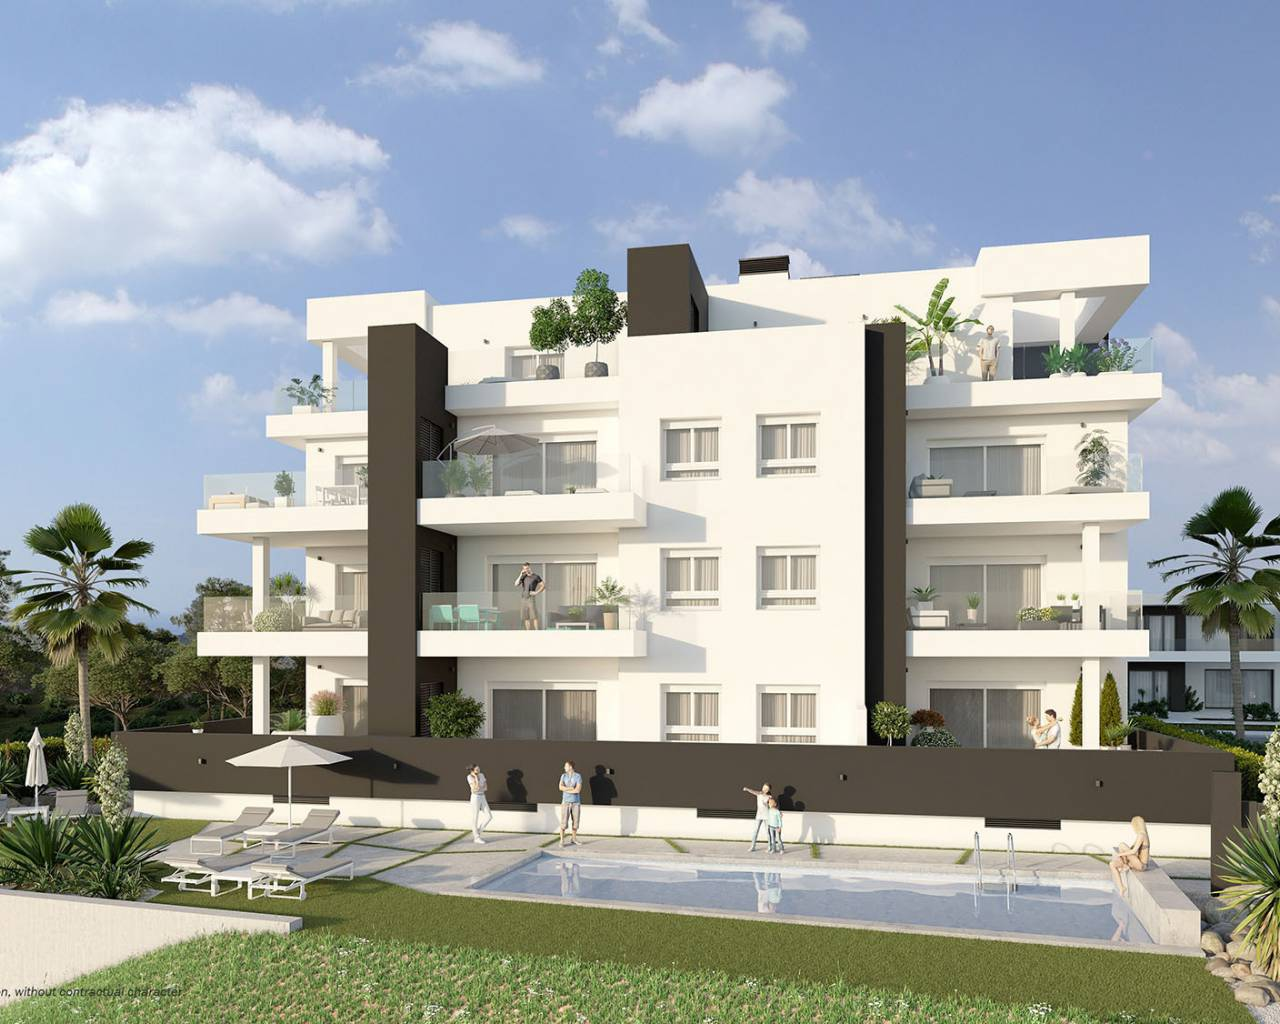 nieuwbouw-appartement-orihuela-costa-villamartin_2419_xl